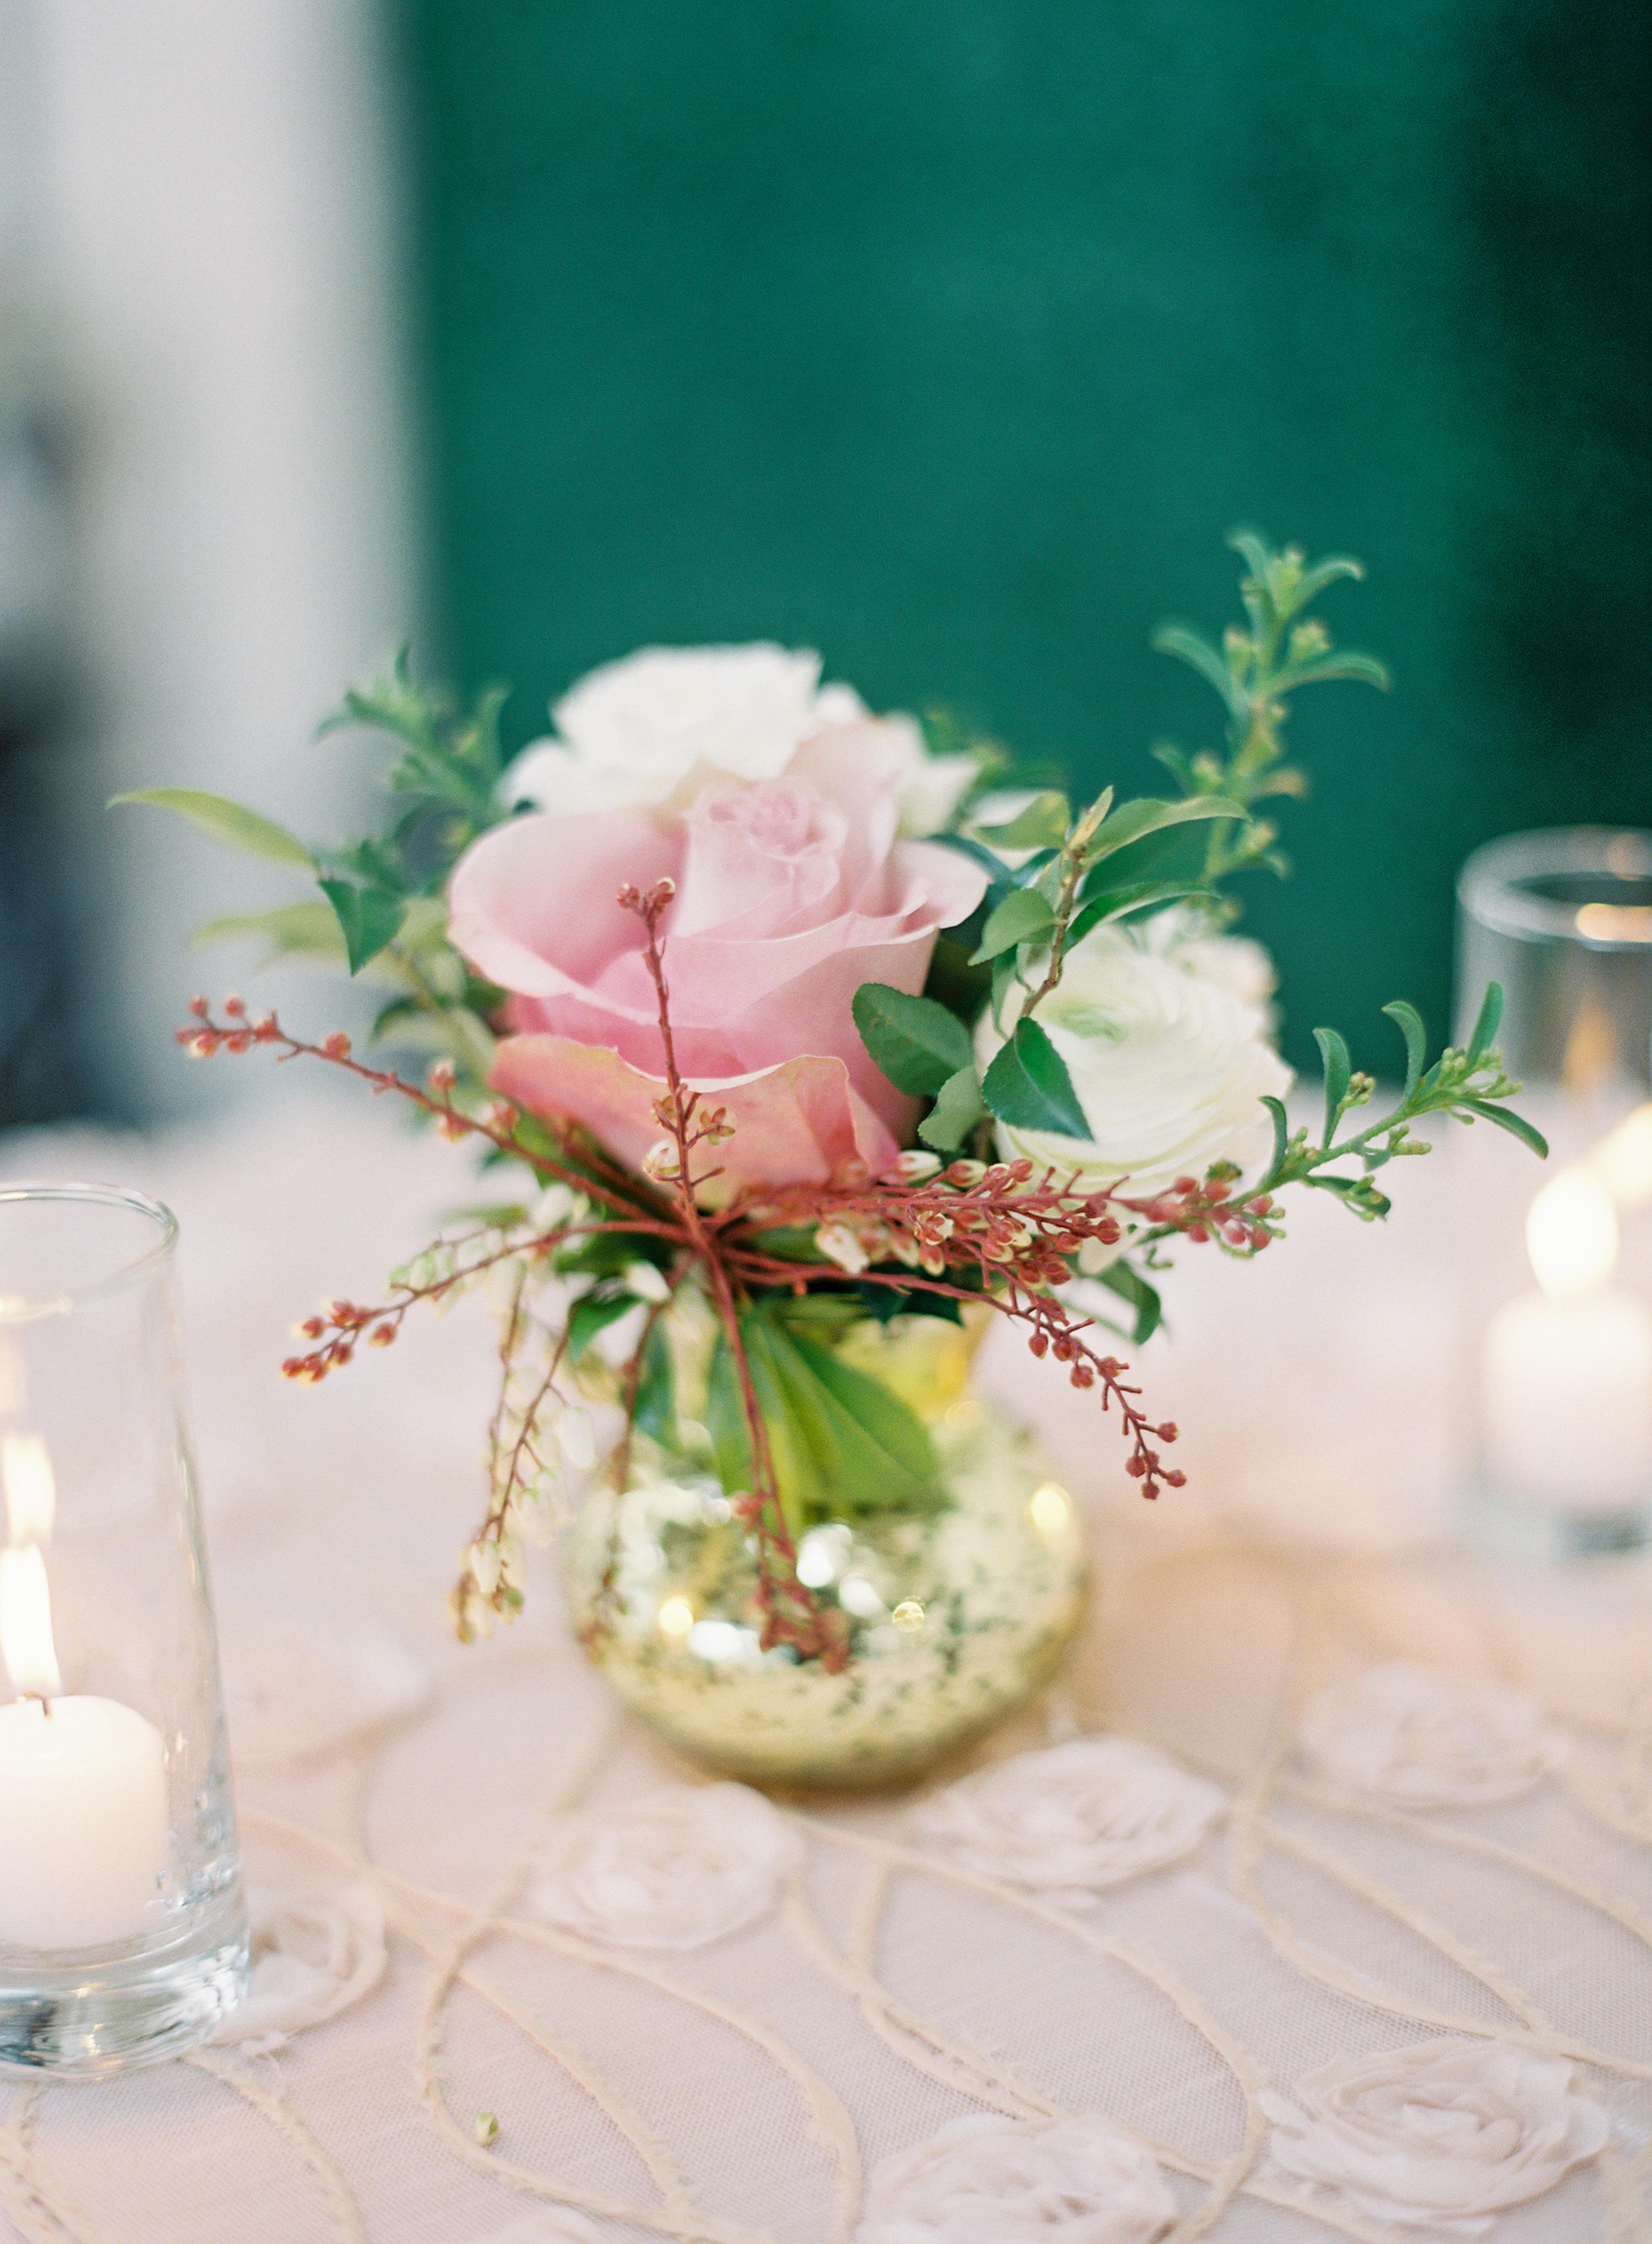 Athenaeum_Wedding_Hi_Res-67-Jen_Huang-005187-R1-004